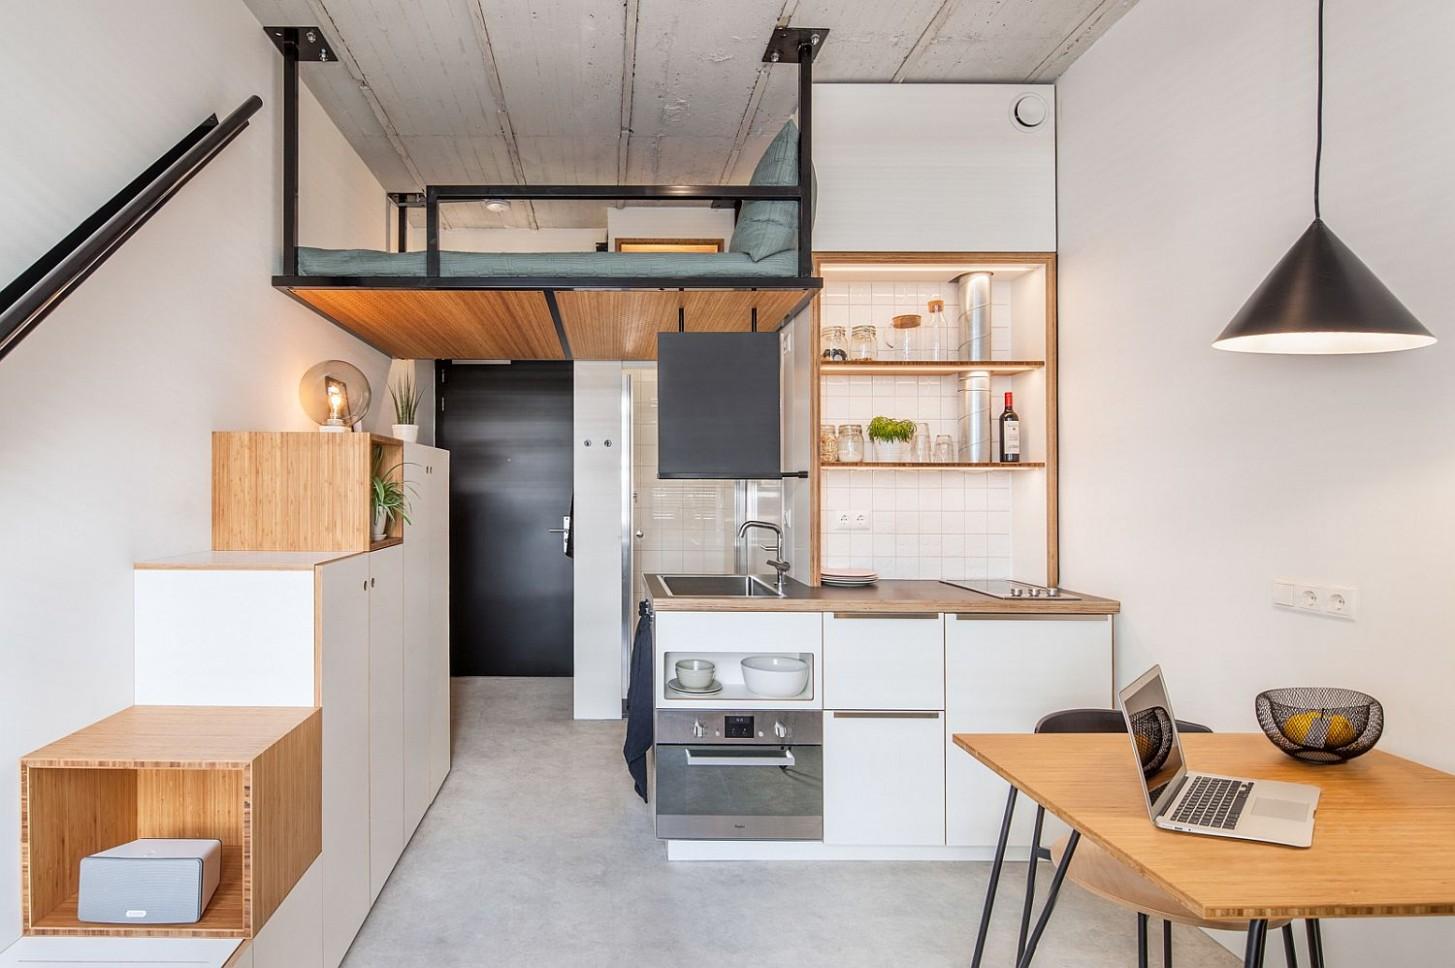 12+ Small Apartment Living Room Design & Decoration Ideas - Apartment Decorating Ideas For Students